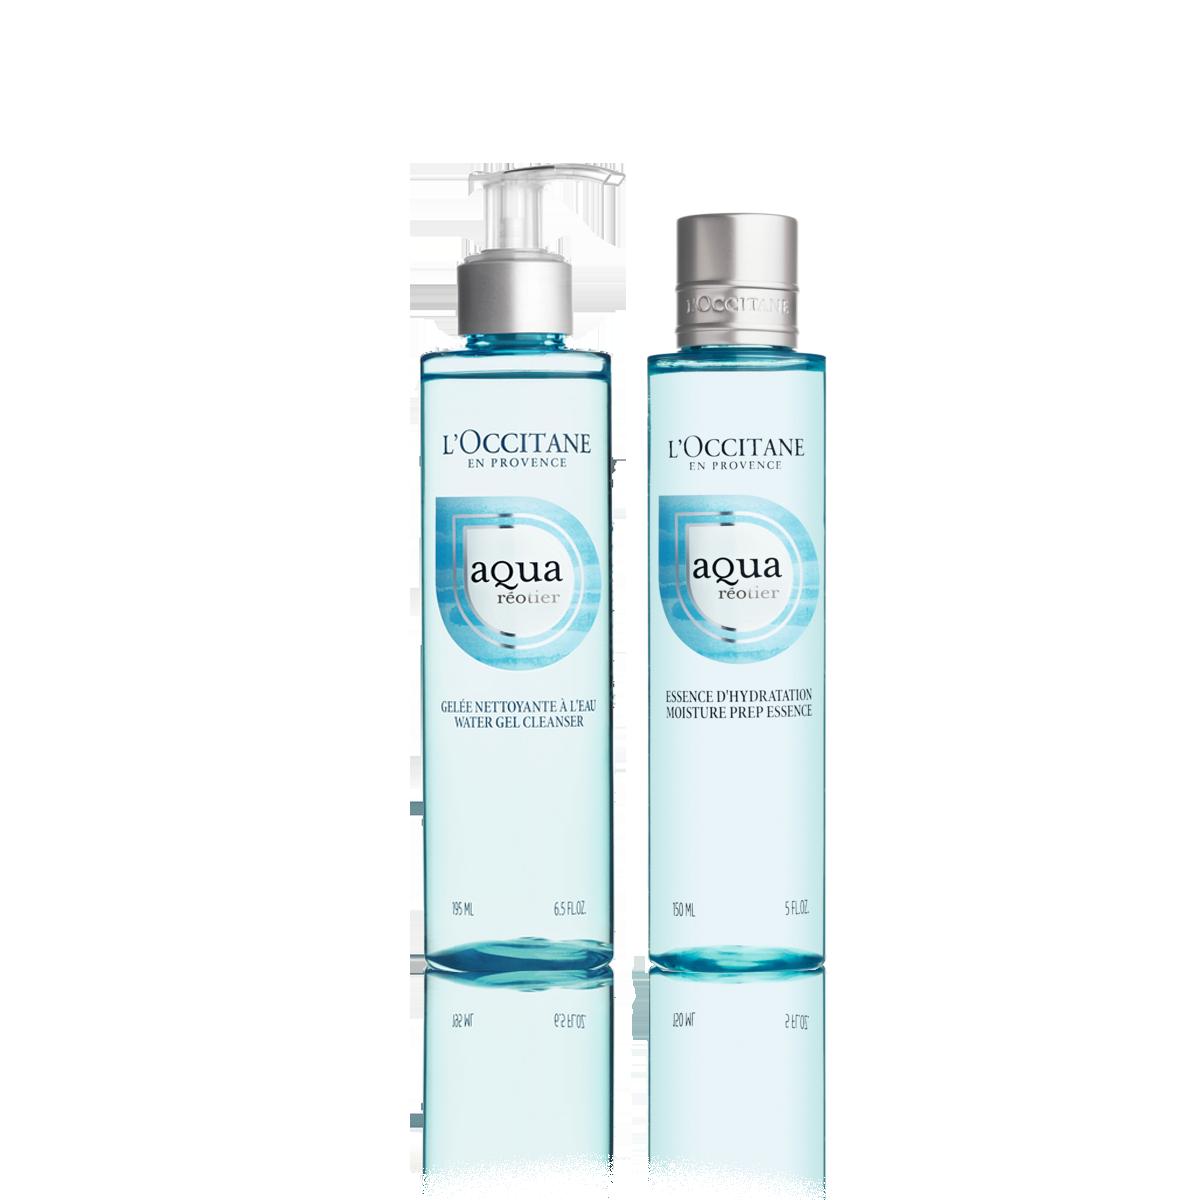 Dúo de Limpieza Facial Aqua Réotier